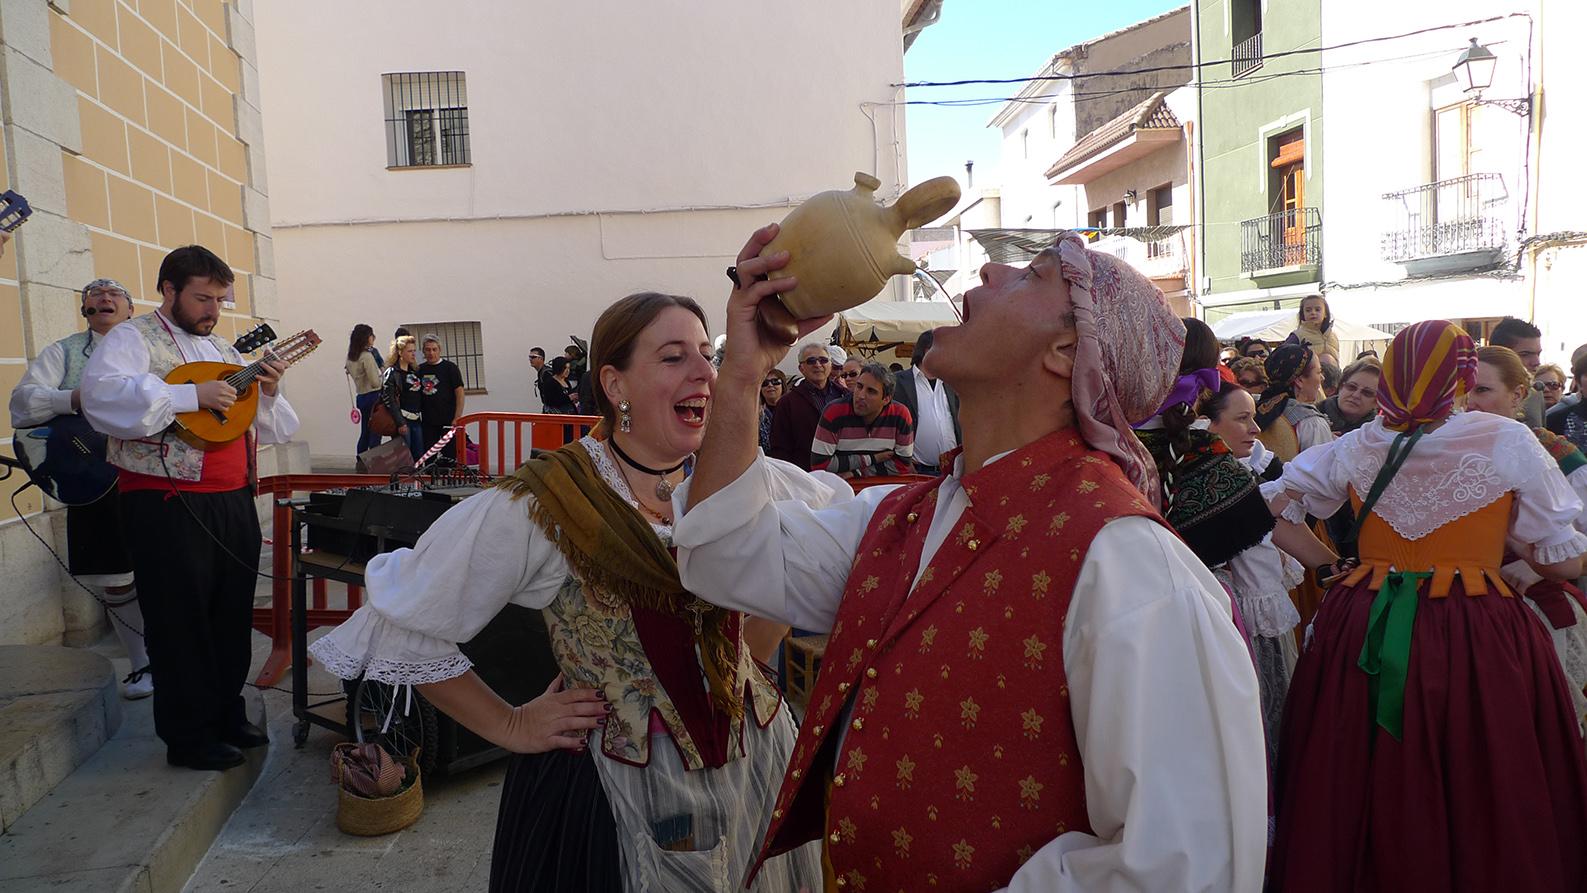 2014-02-23 - Baladre a Fira St. Marcia-ROTOVA (47)